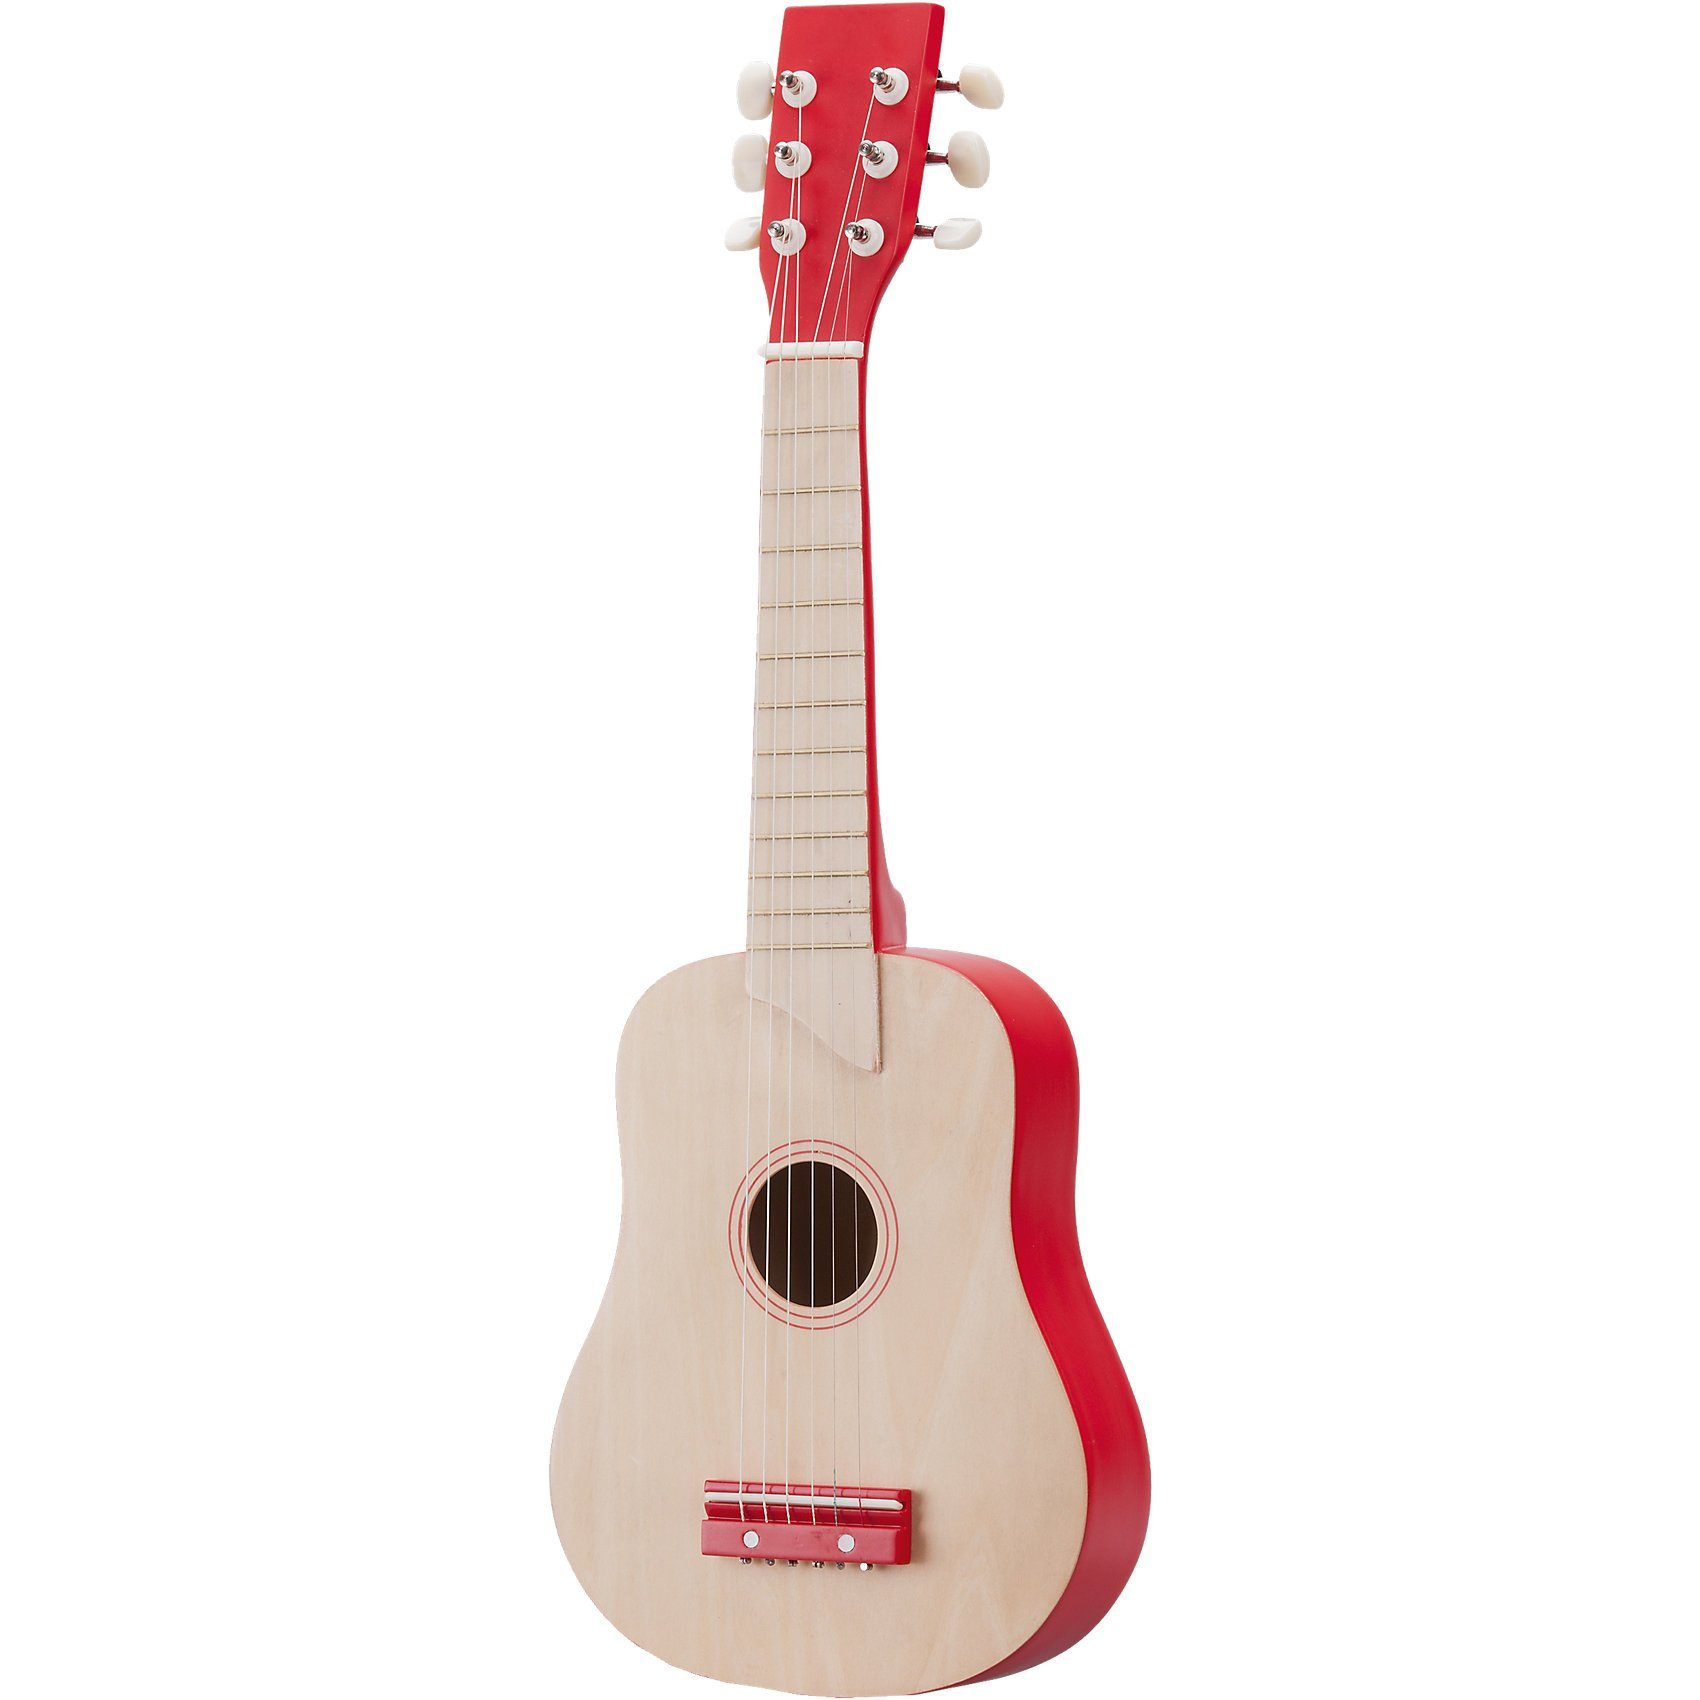 Eitech Gitarre 64 cm